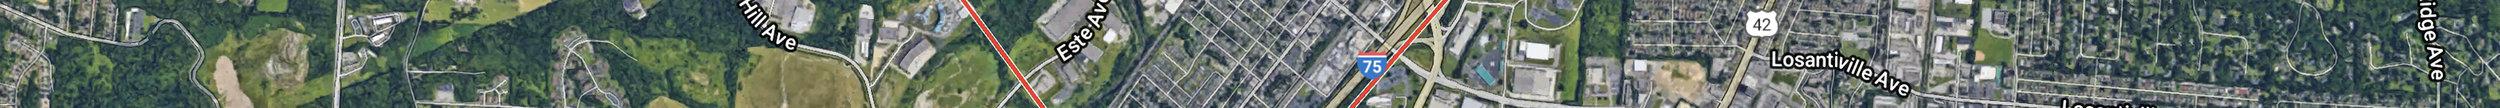 map bar.jpg